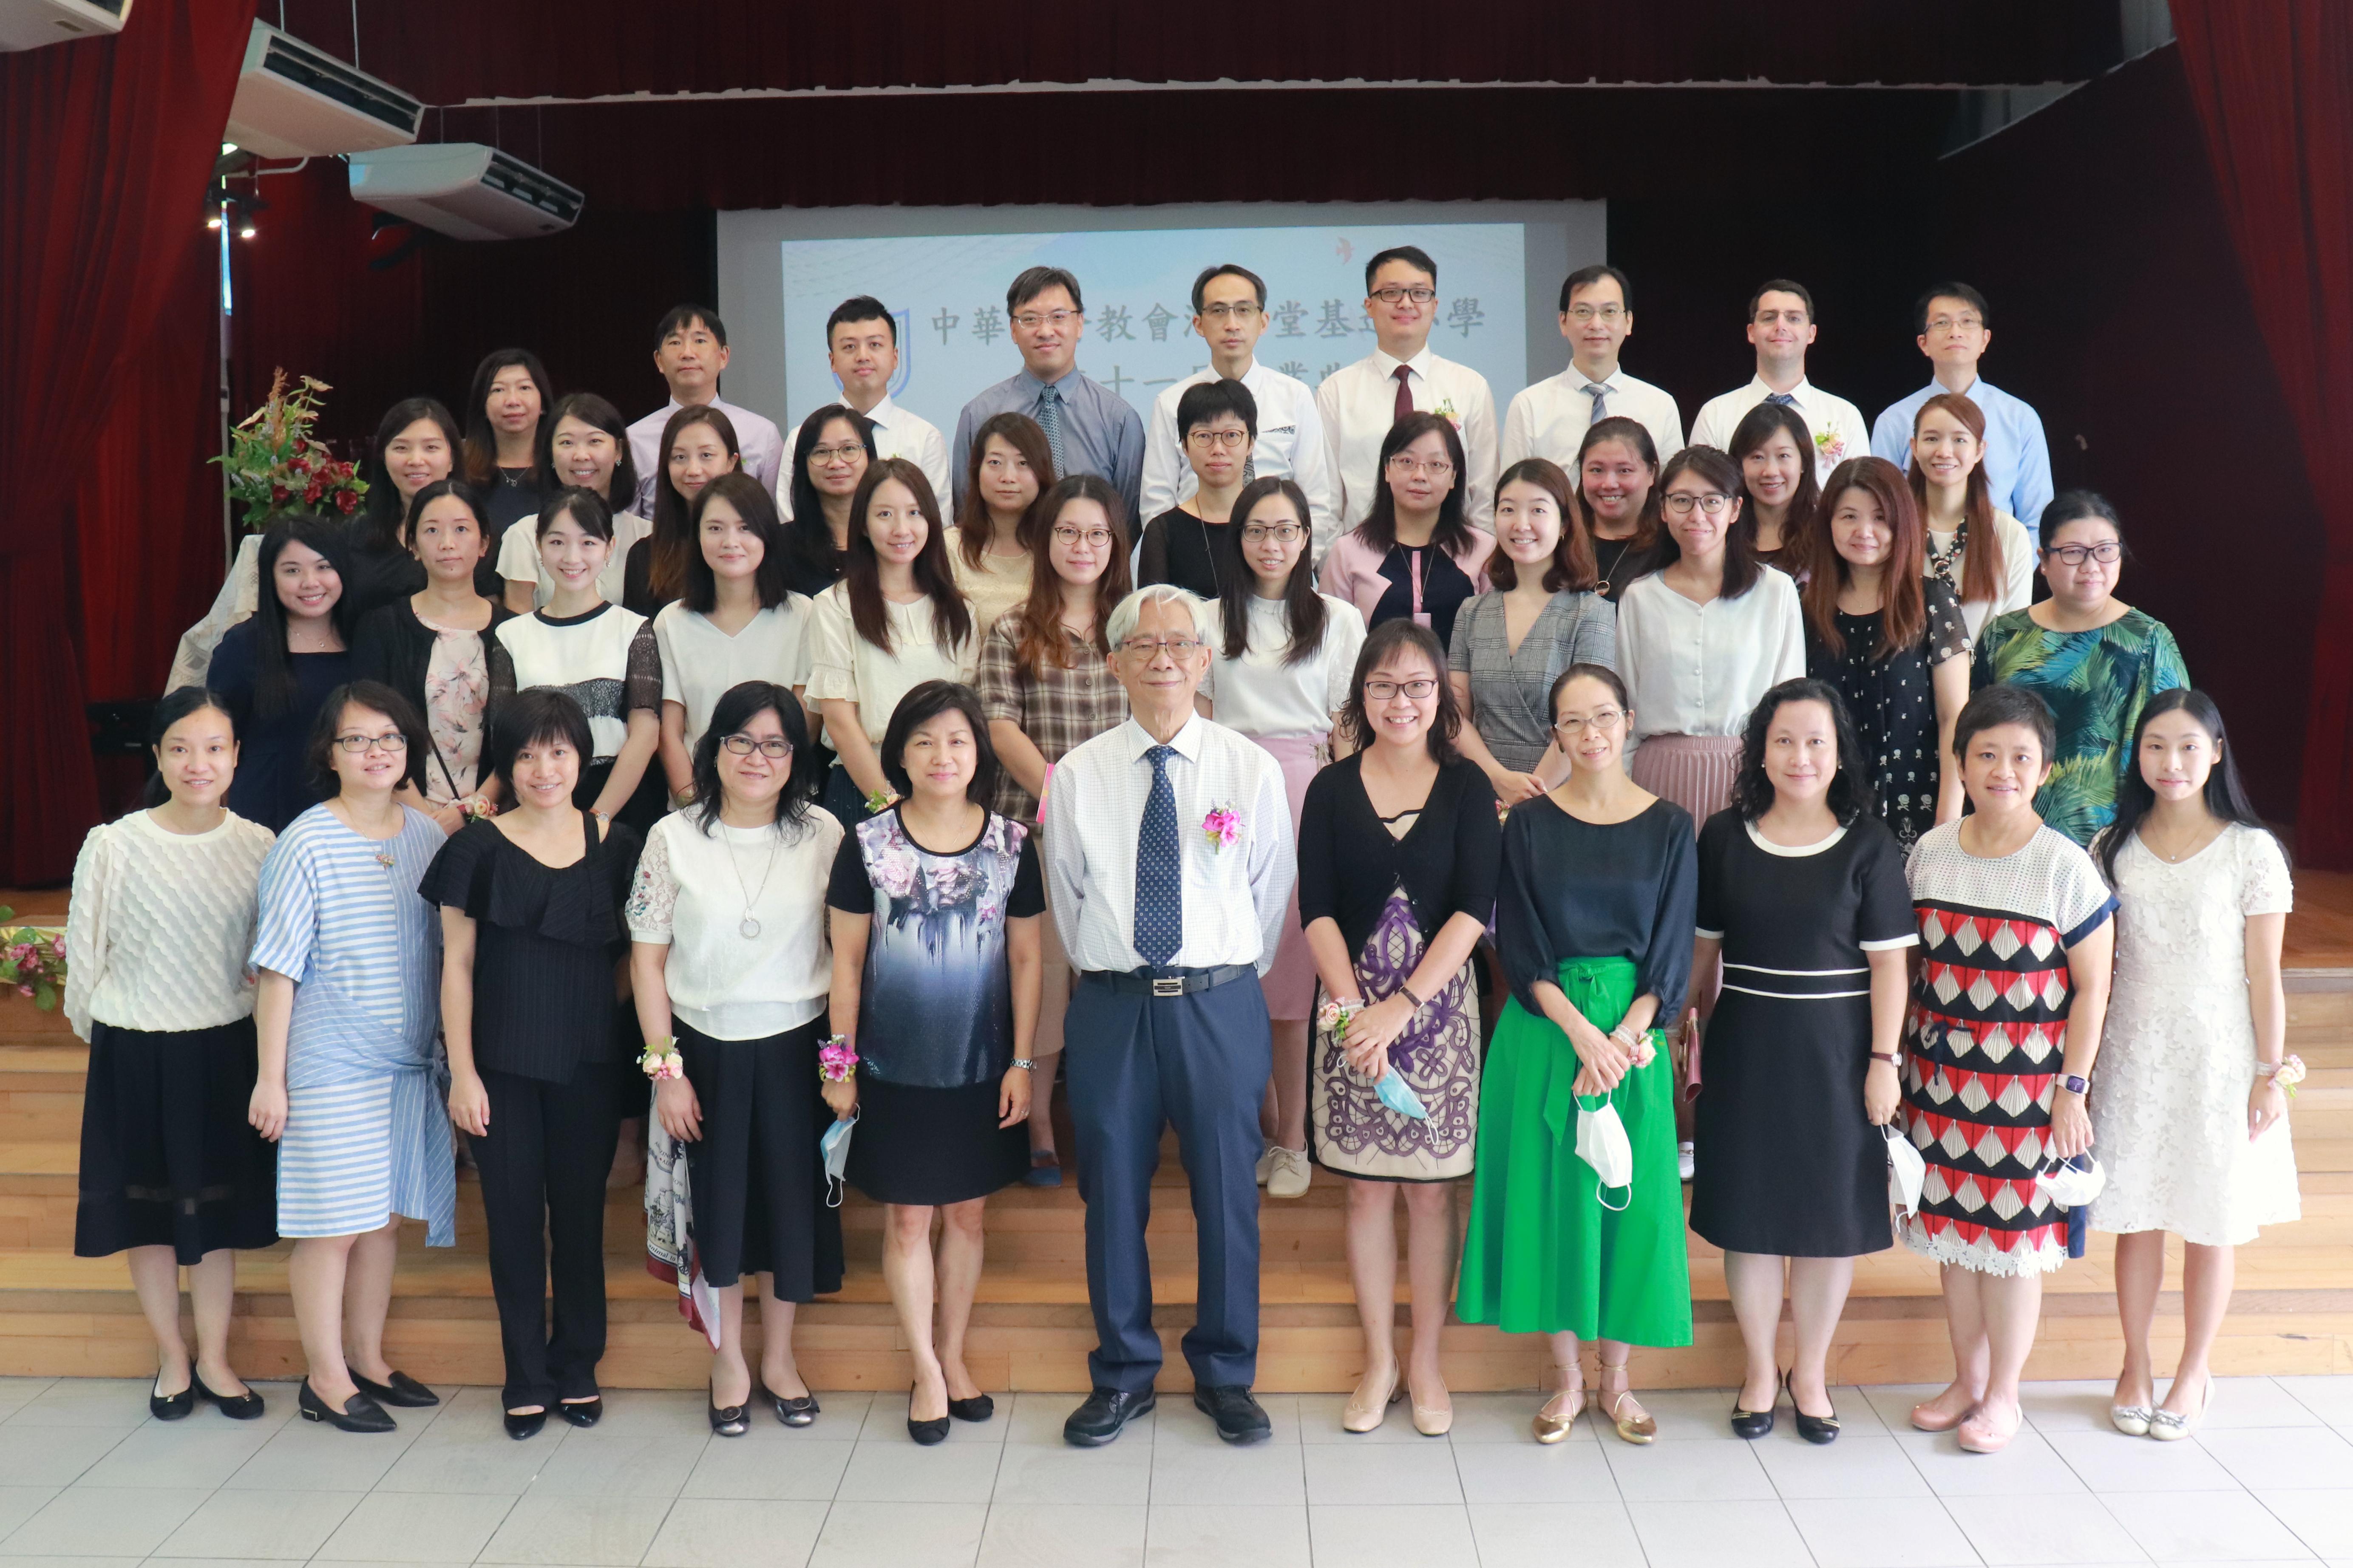 http://keito.school.hk/sites/default/files/img_5946.jpg